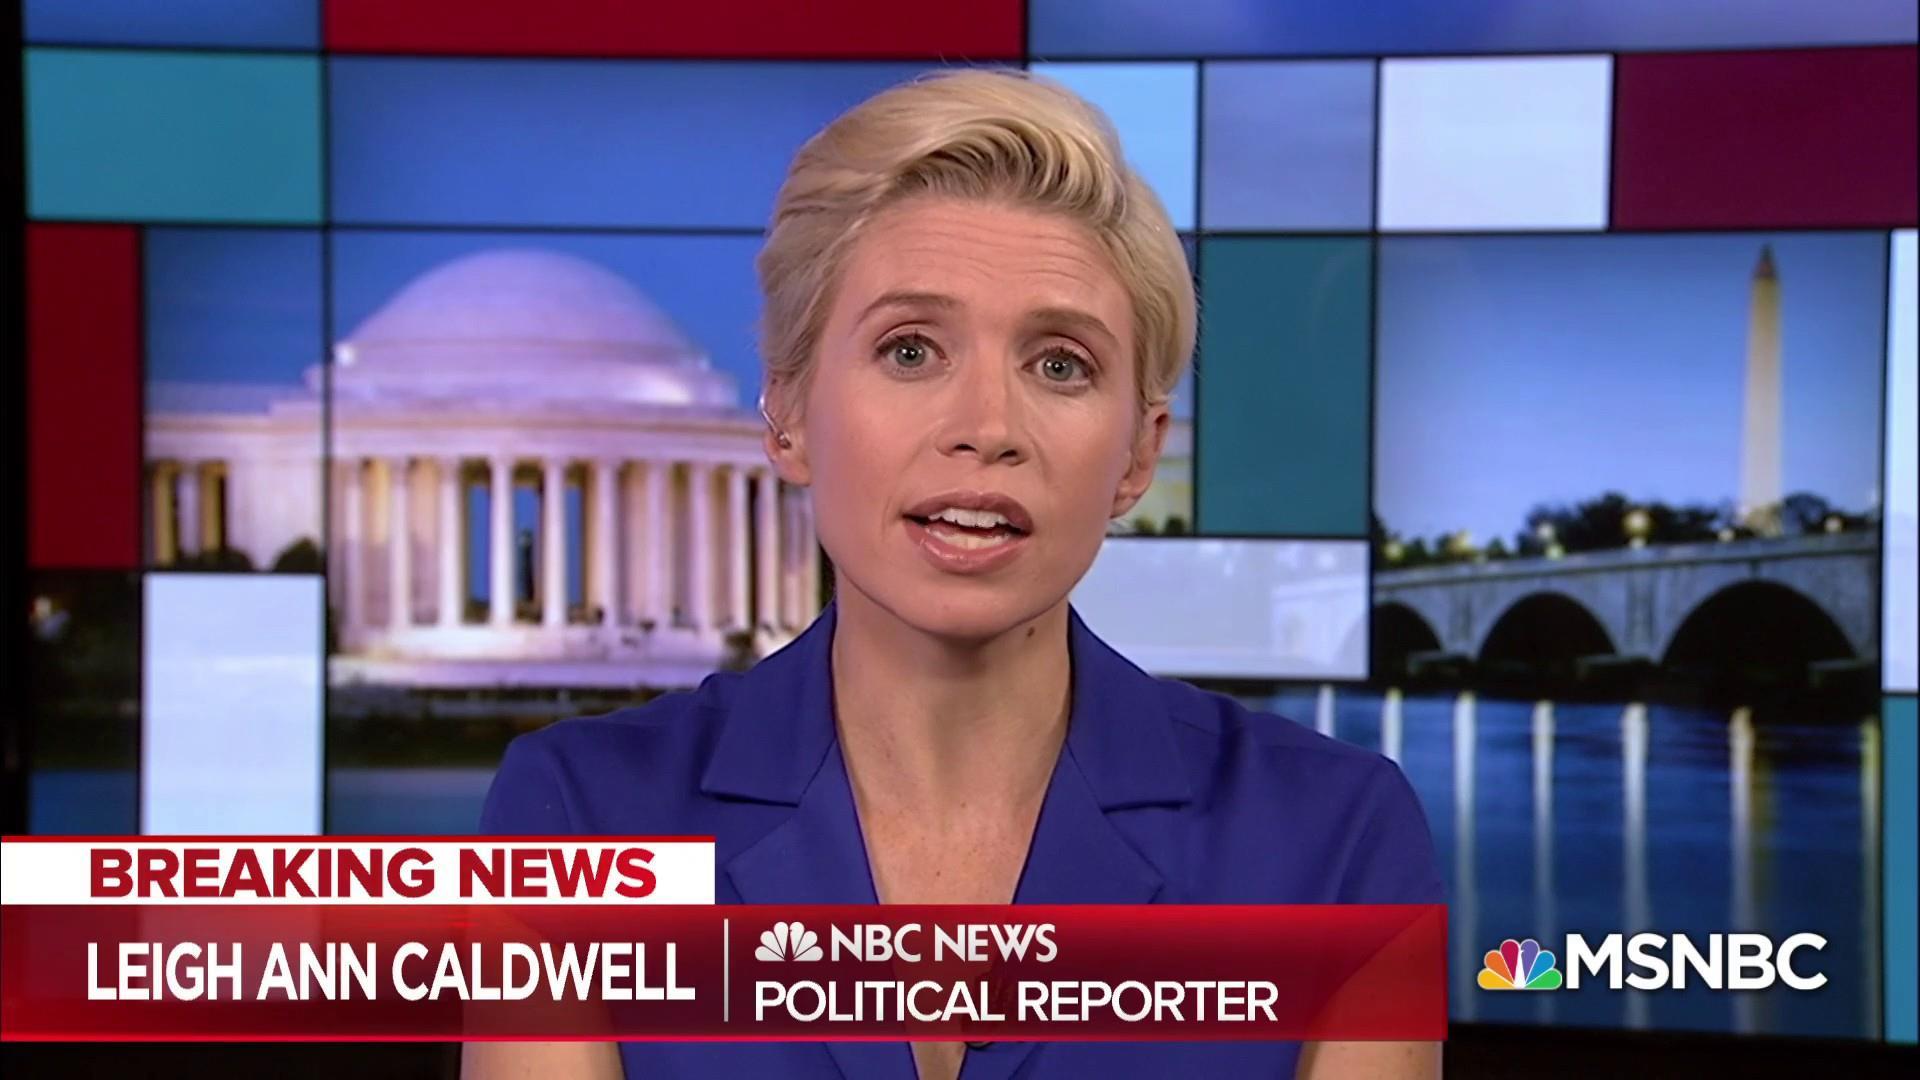 New Kavanaugh stories emerge as FBI investigation has rough start